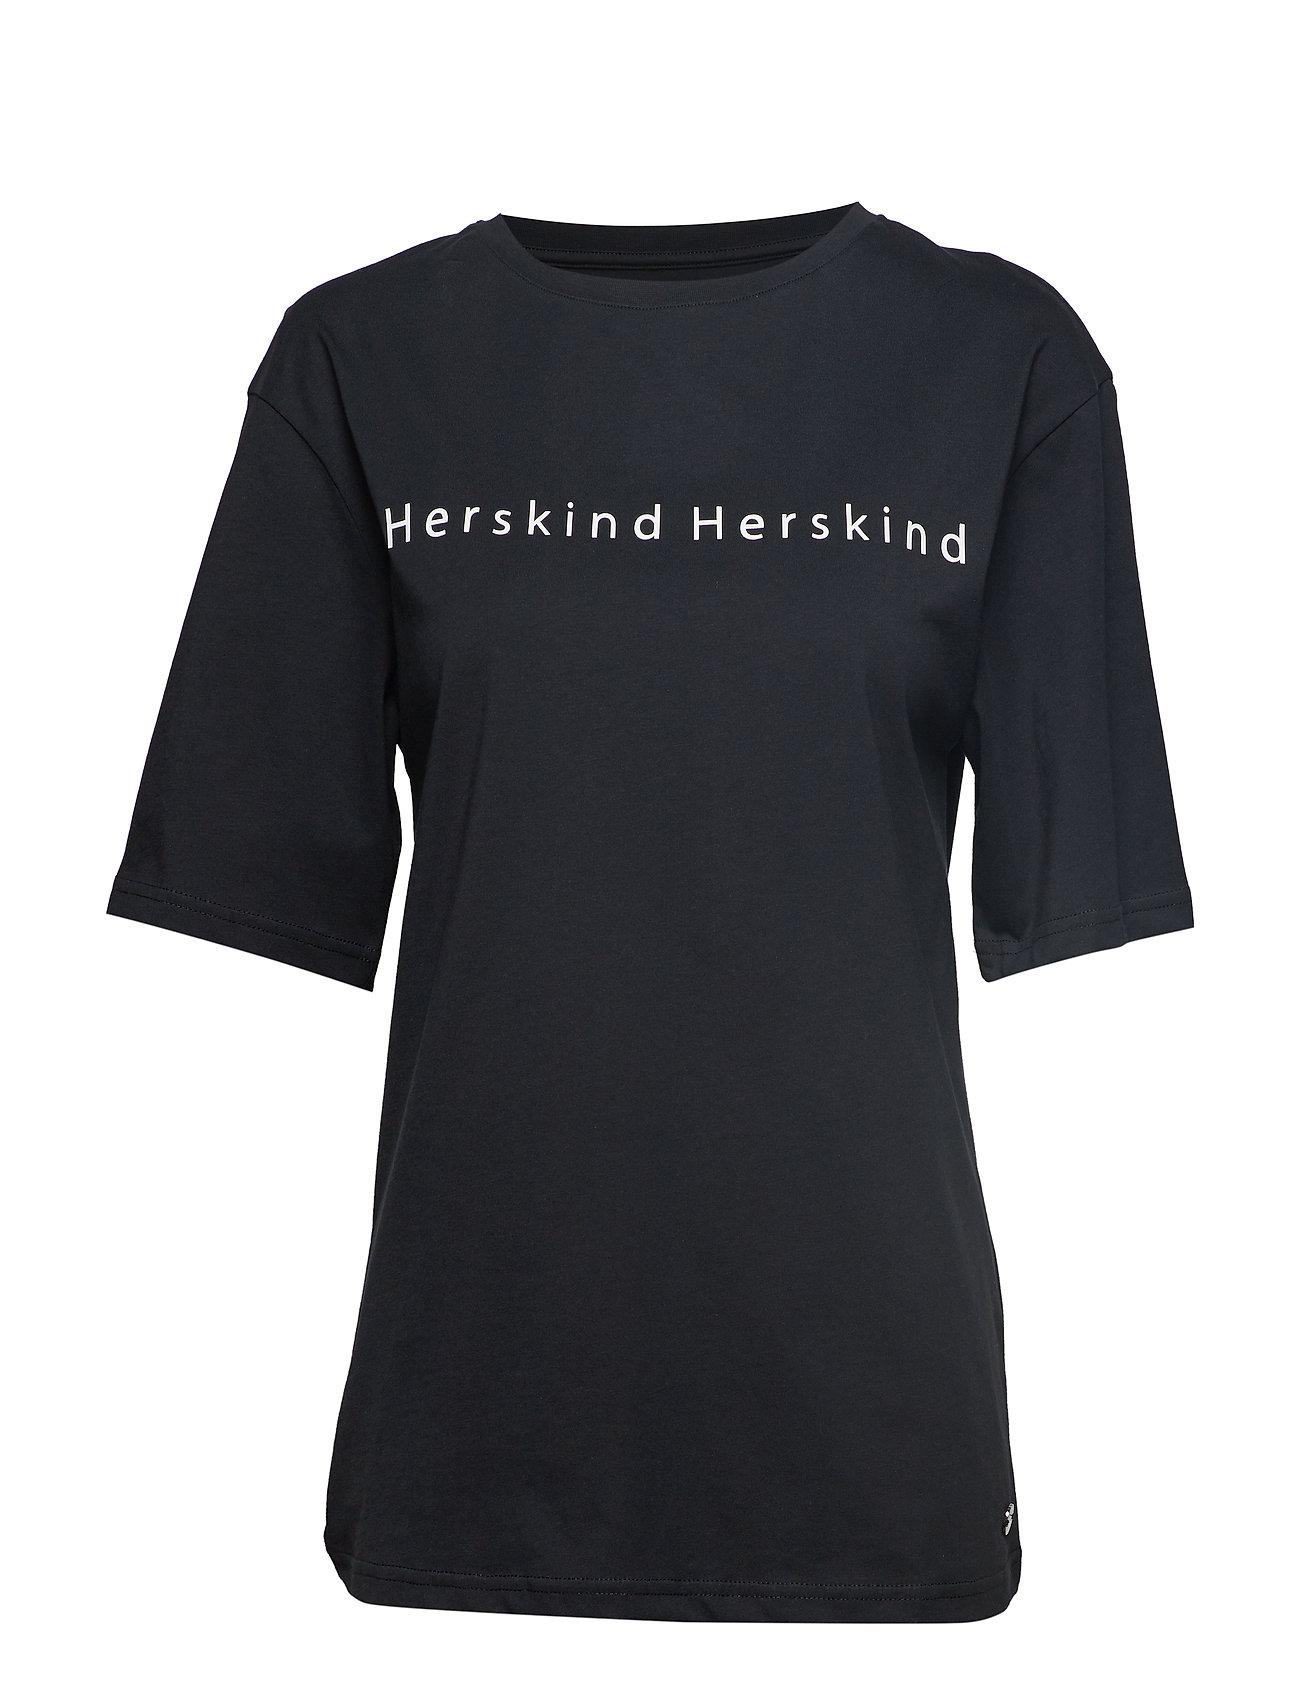 Birgitte Herskind Barbara T-shirt - BLACK